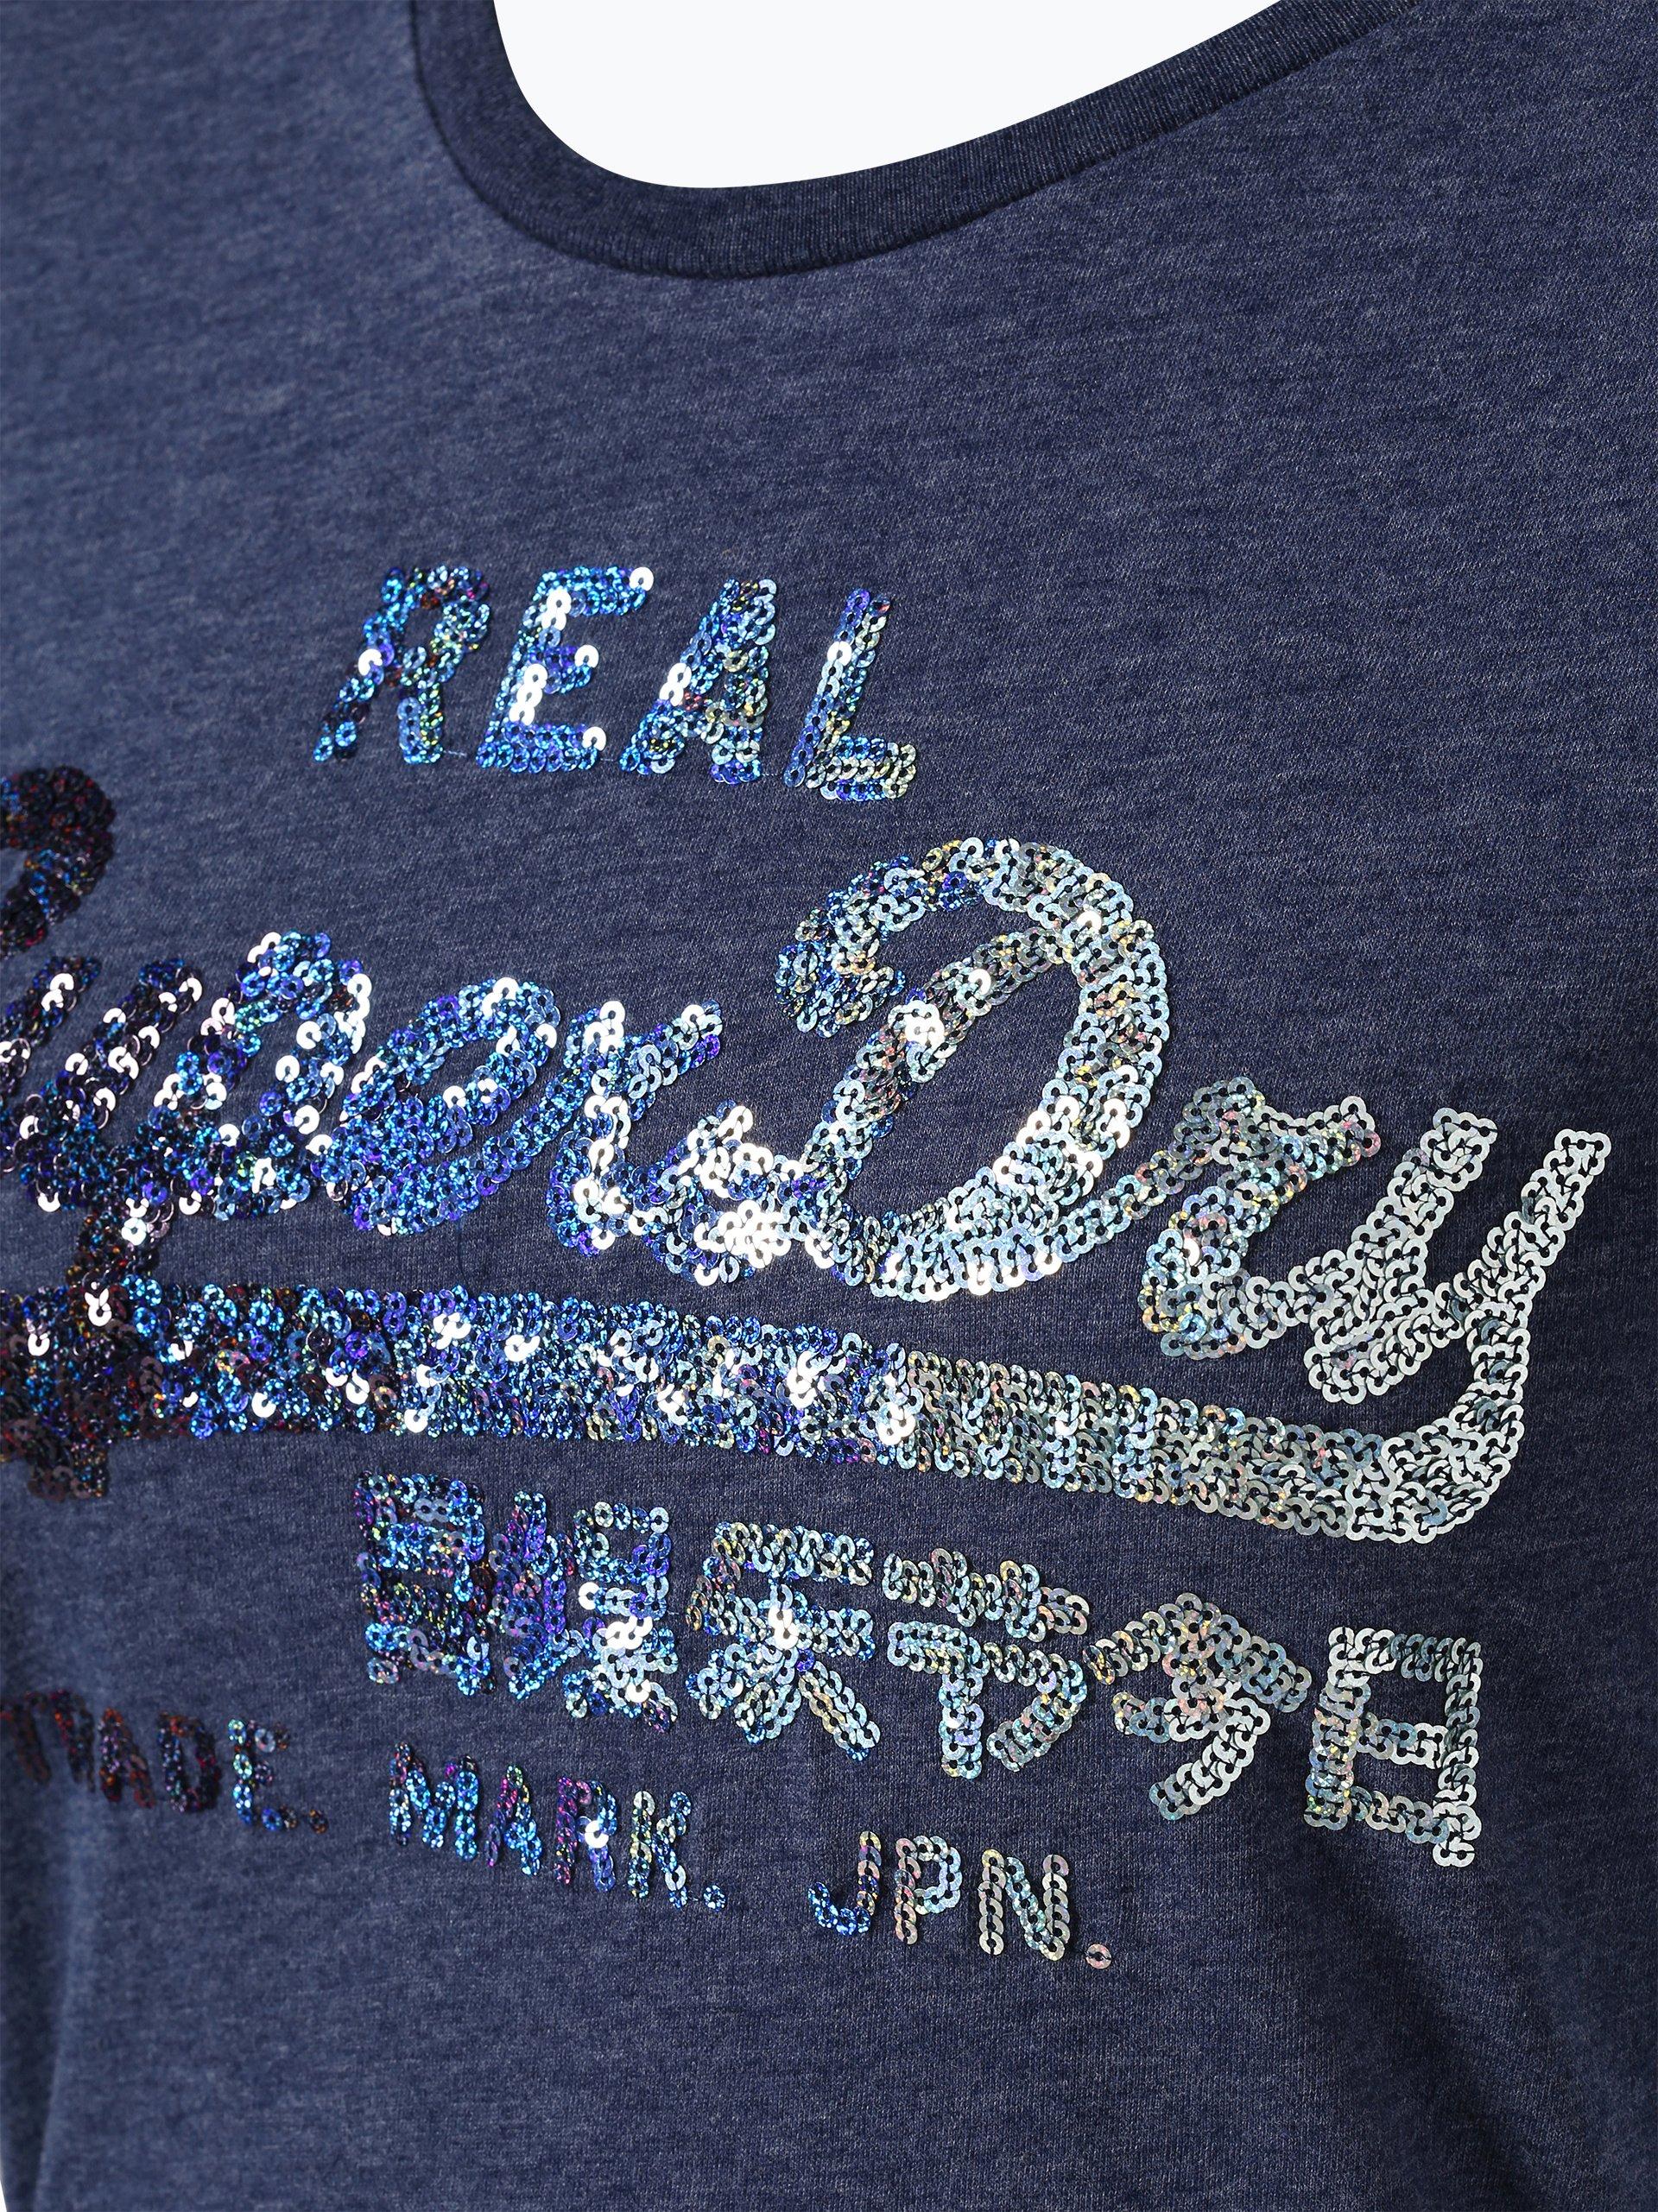 superdry damen t shirt blau denim uni online kaufen. Black Bedroom Furniture Sets. Home Design Ideas